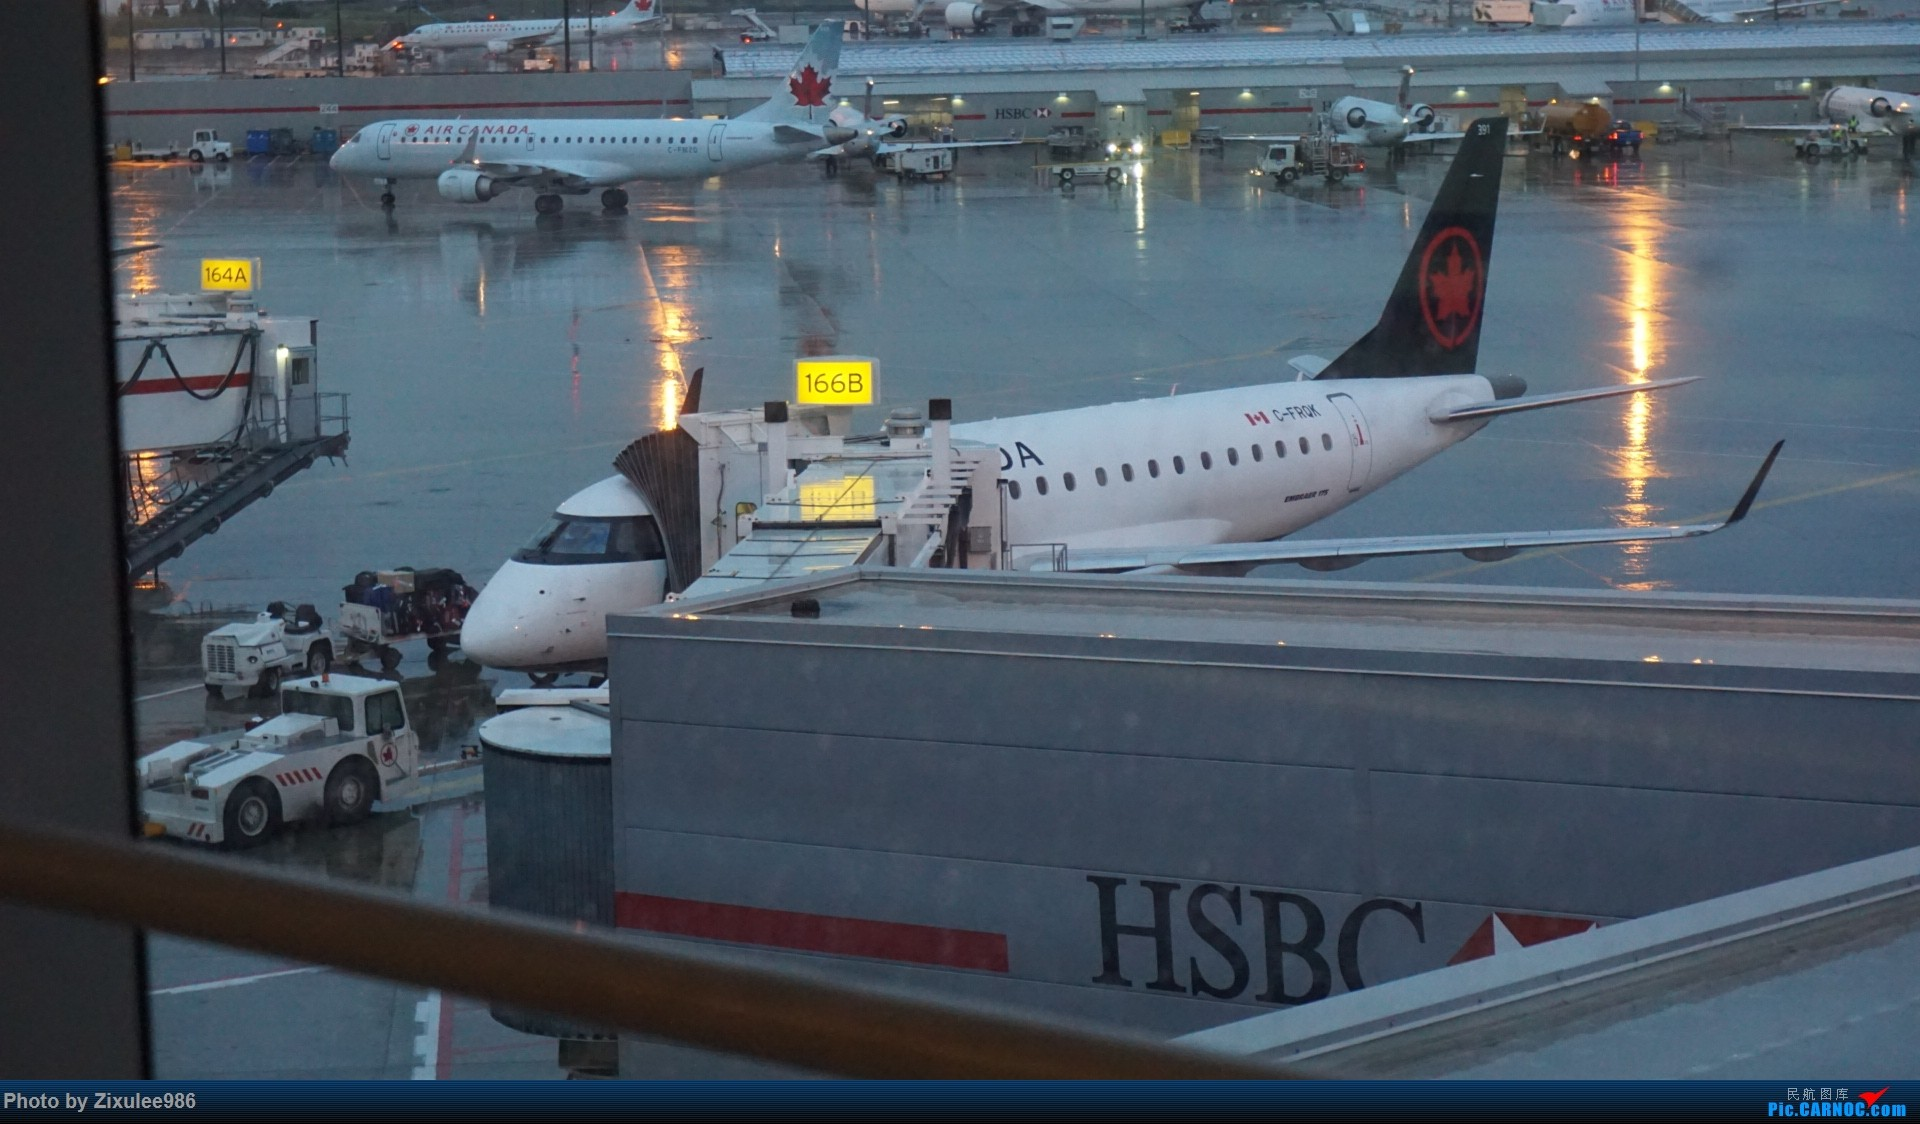 Re:[原创]加拿大21日游学之旅 (二)~加航AC28..PVG-YYZ到达多村后的雨天~多图缓更(将会附上上一集忘发的flightlog)请各位大侠谅解~ EMBRAER E-190 C-FRQK 加拿大多伦多皮尔逊机场